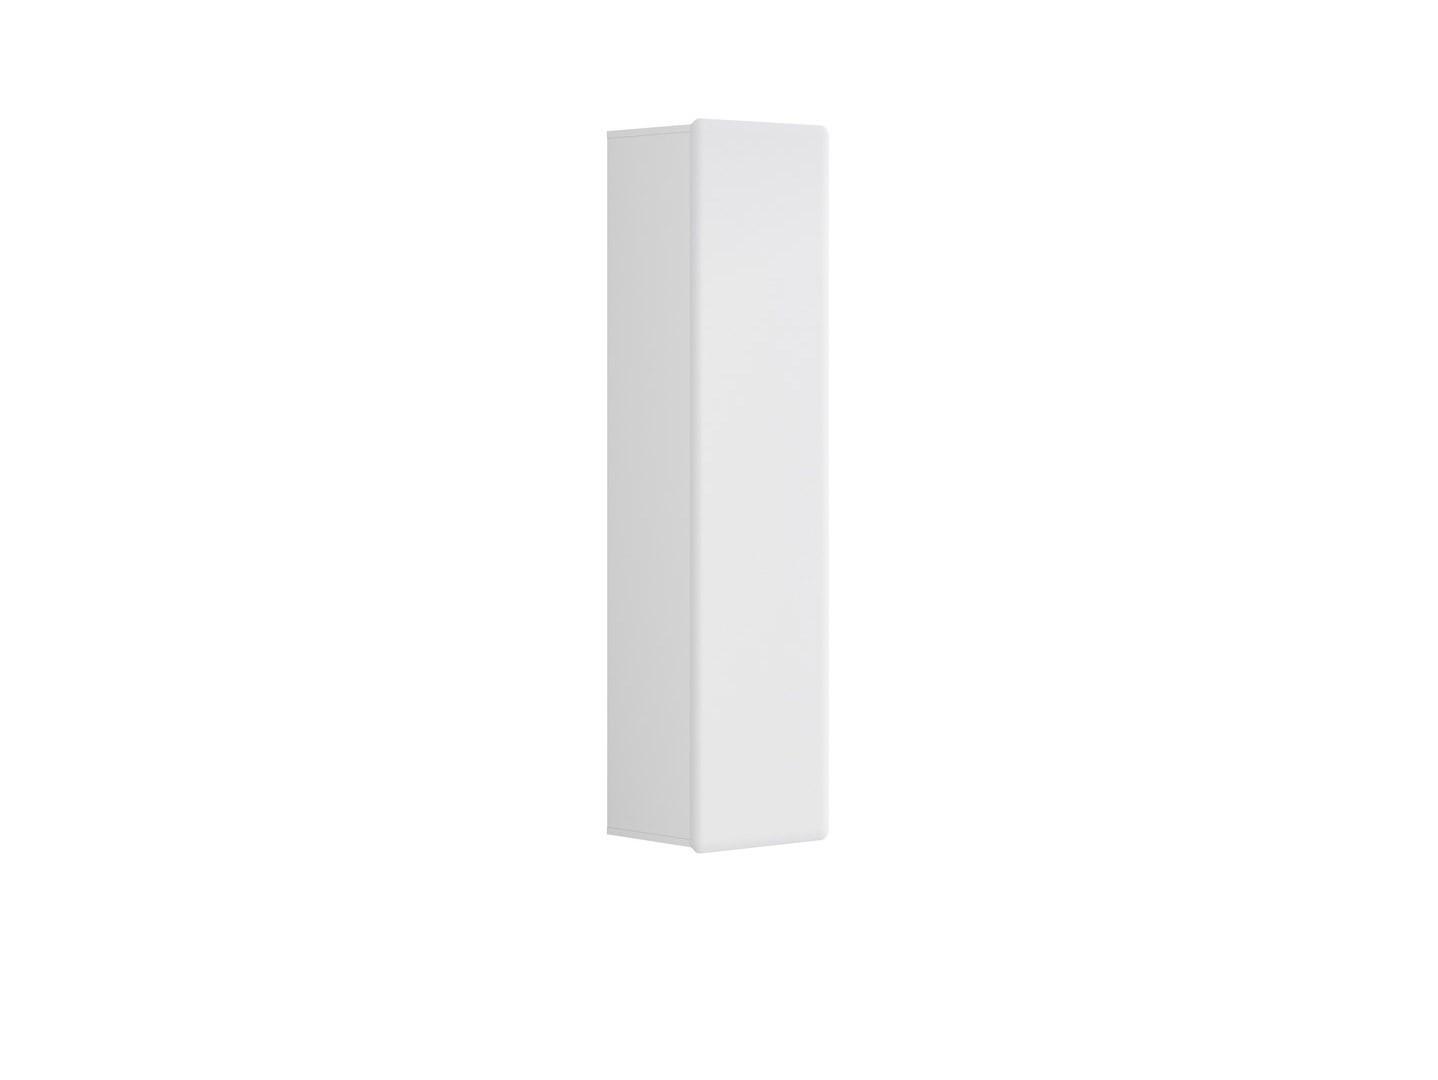 Skříňka na stěnu - BRW - Possi Light - SFW1D/16/4 (bílá + lesk bílý)